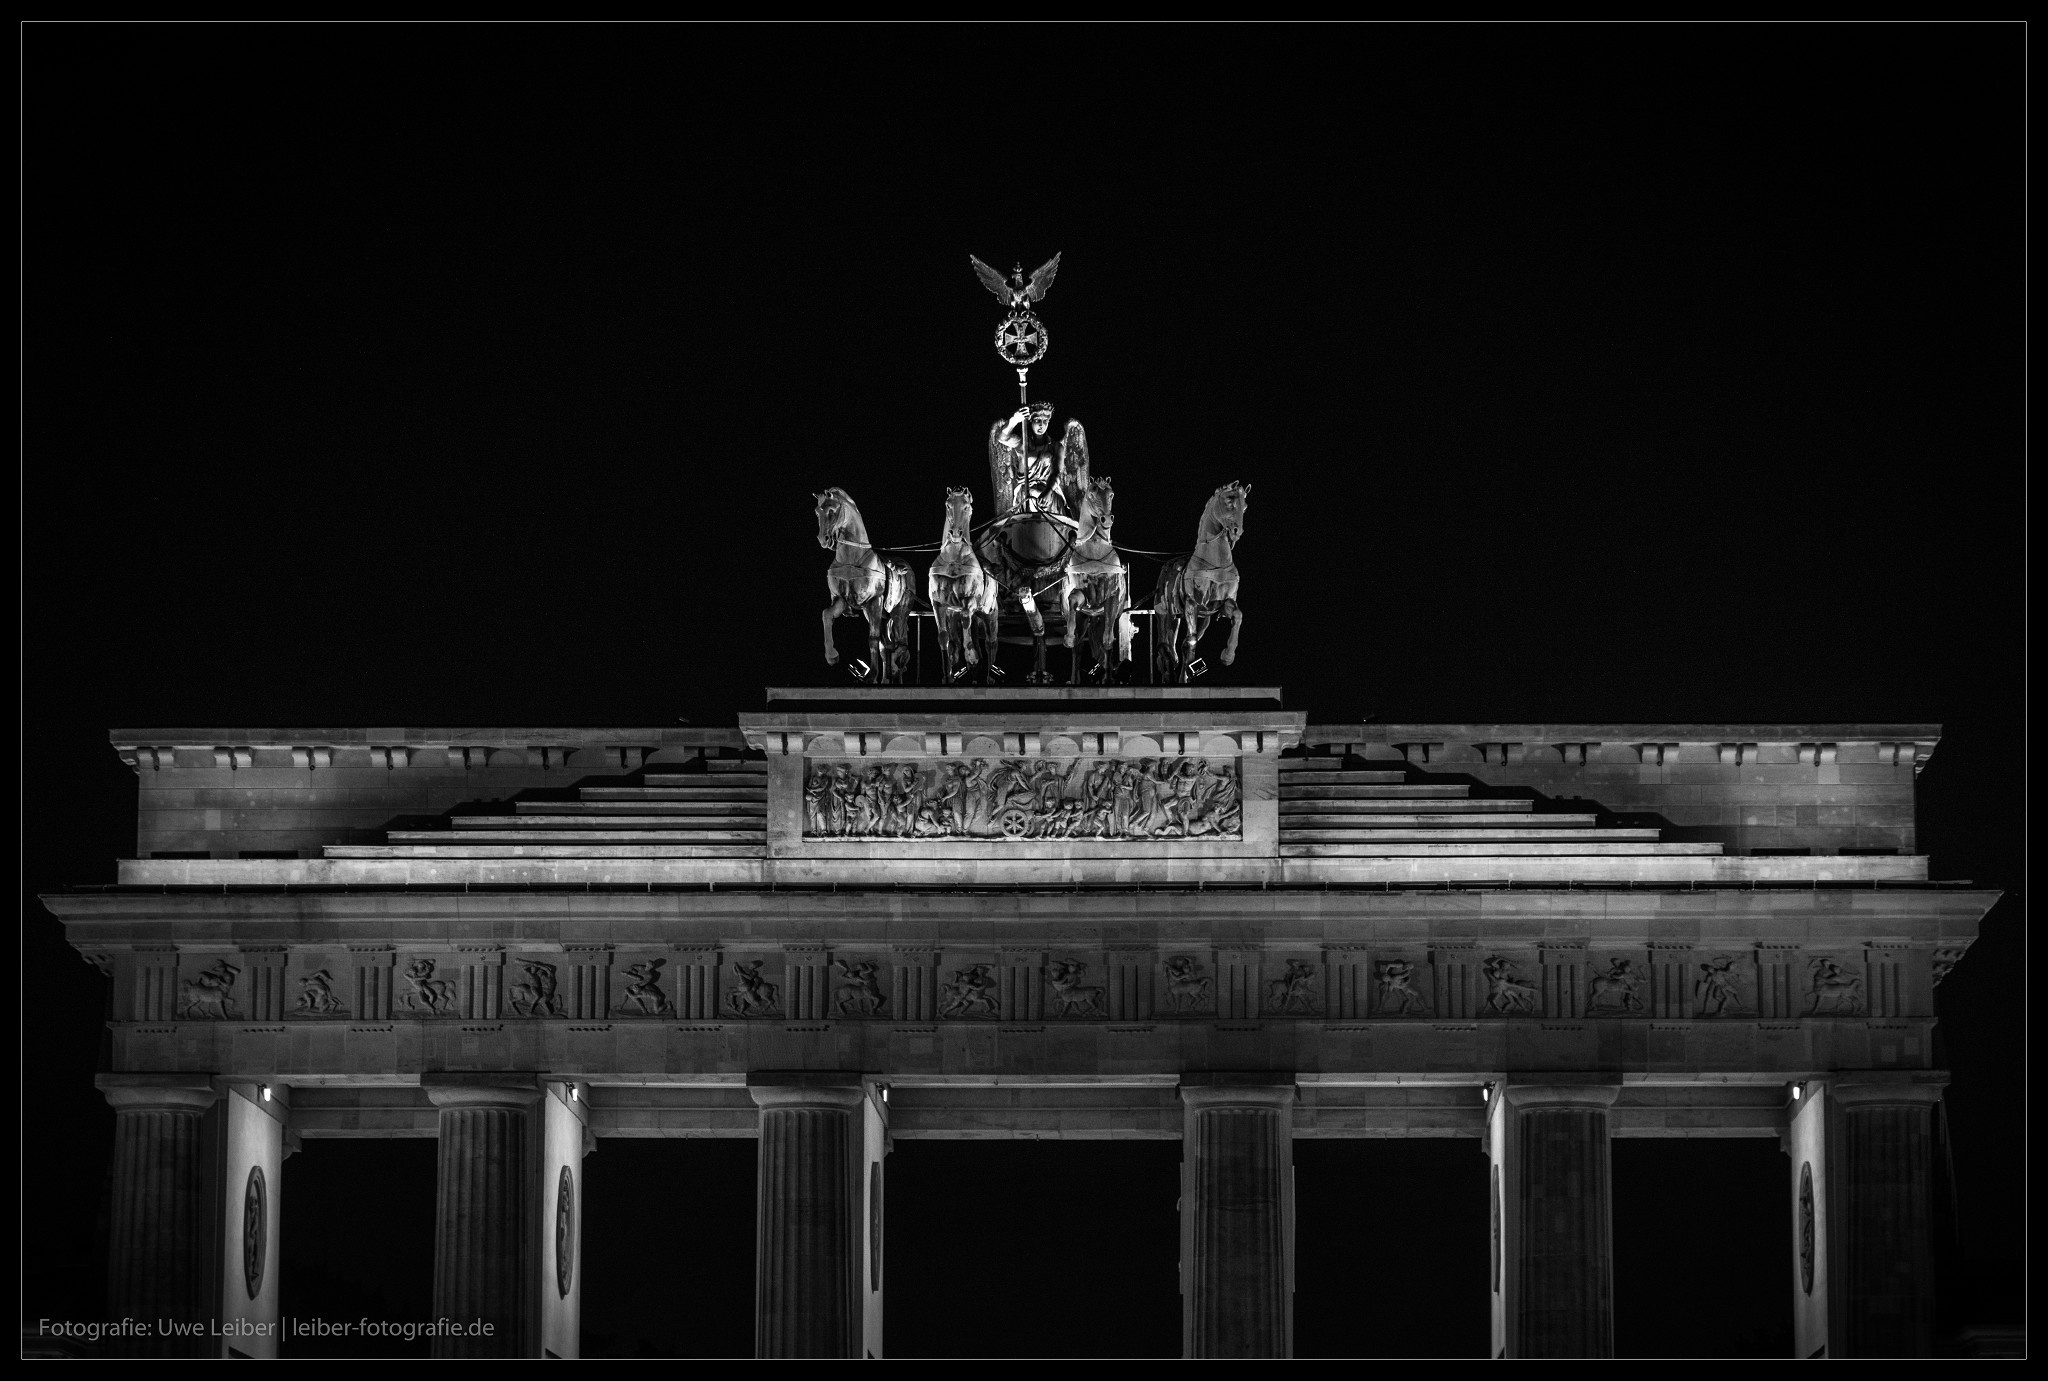 Berlin | Brandenburger Tor